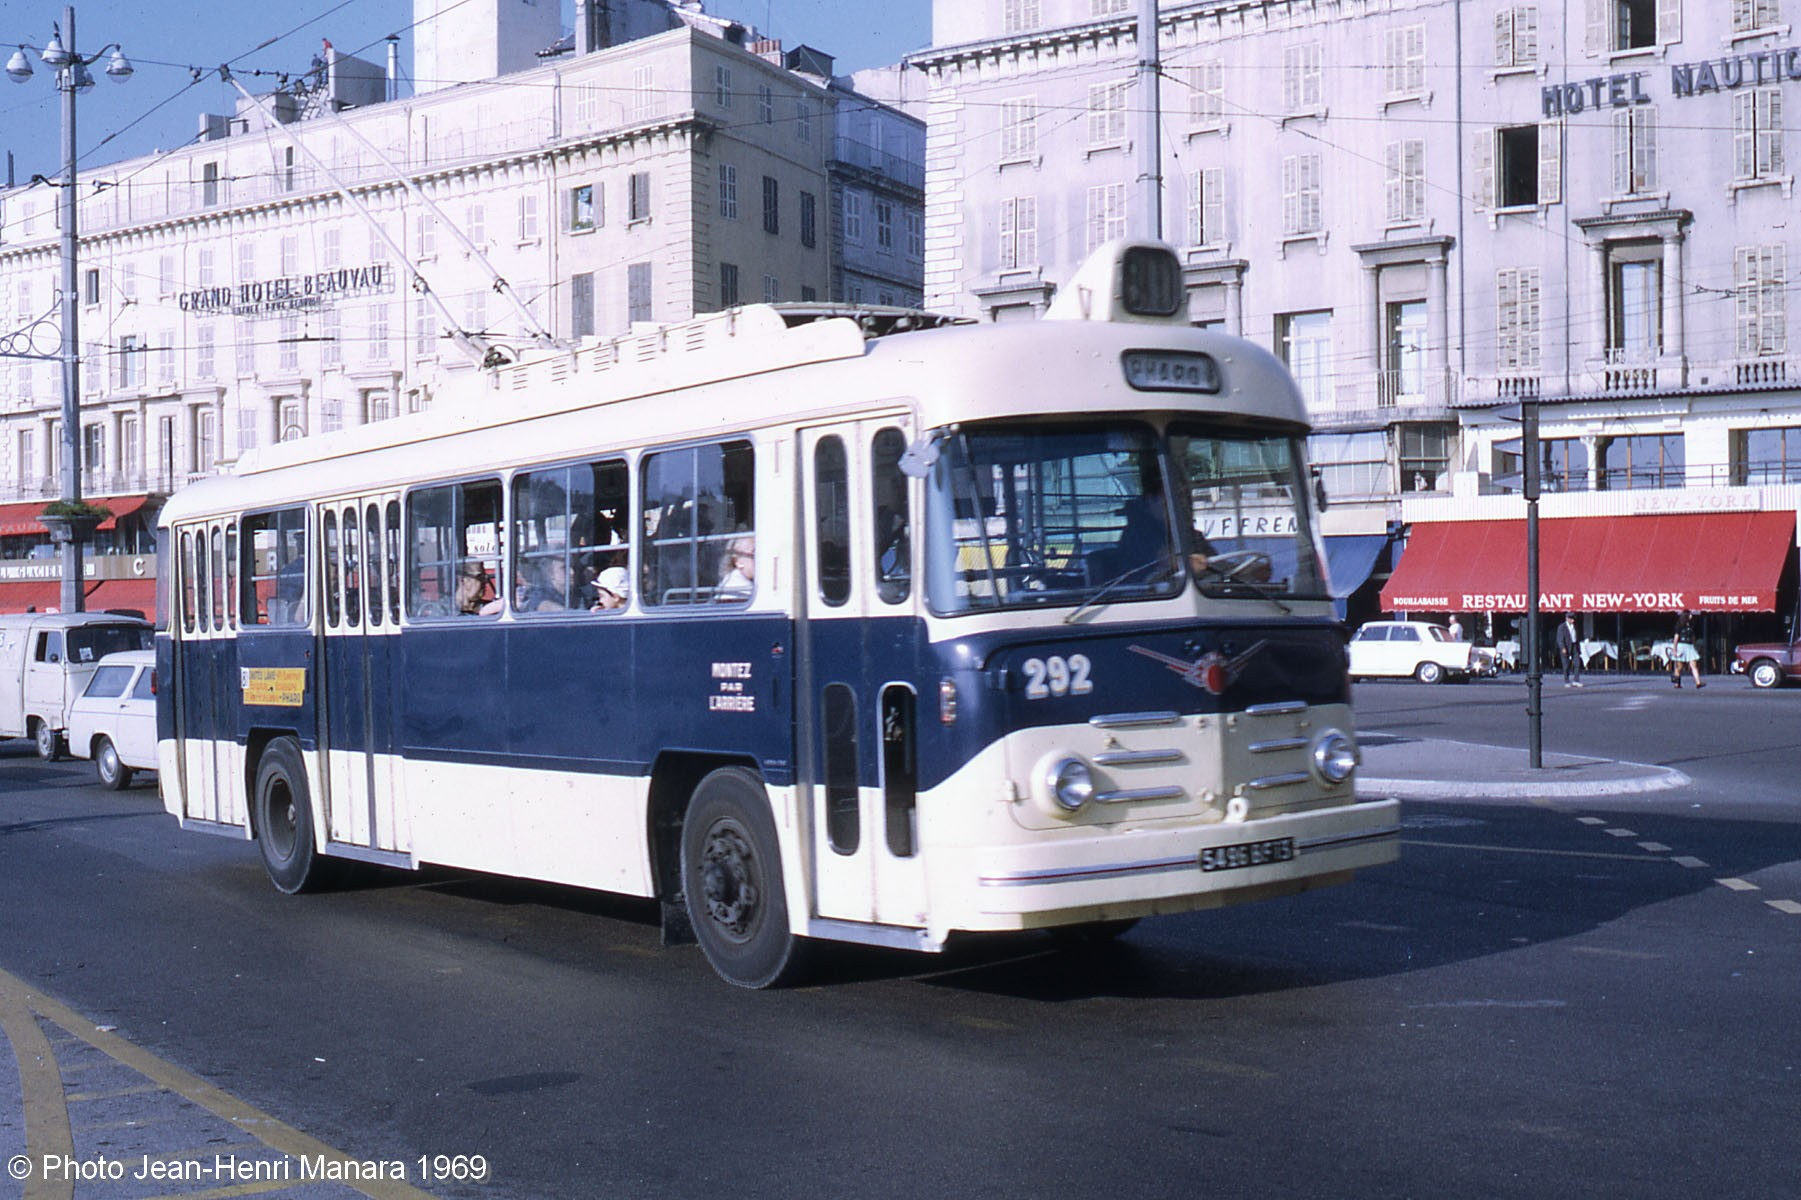 les trolleybus de marseille page 3 photos. Black Bedroom Furniture Sets. Home Design Ideas